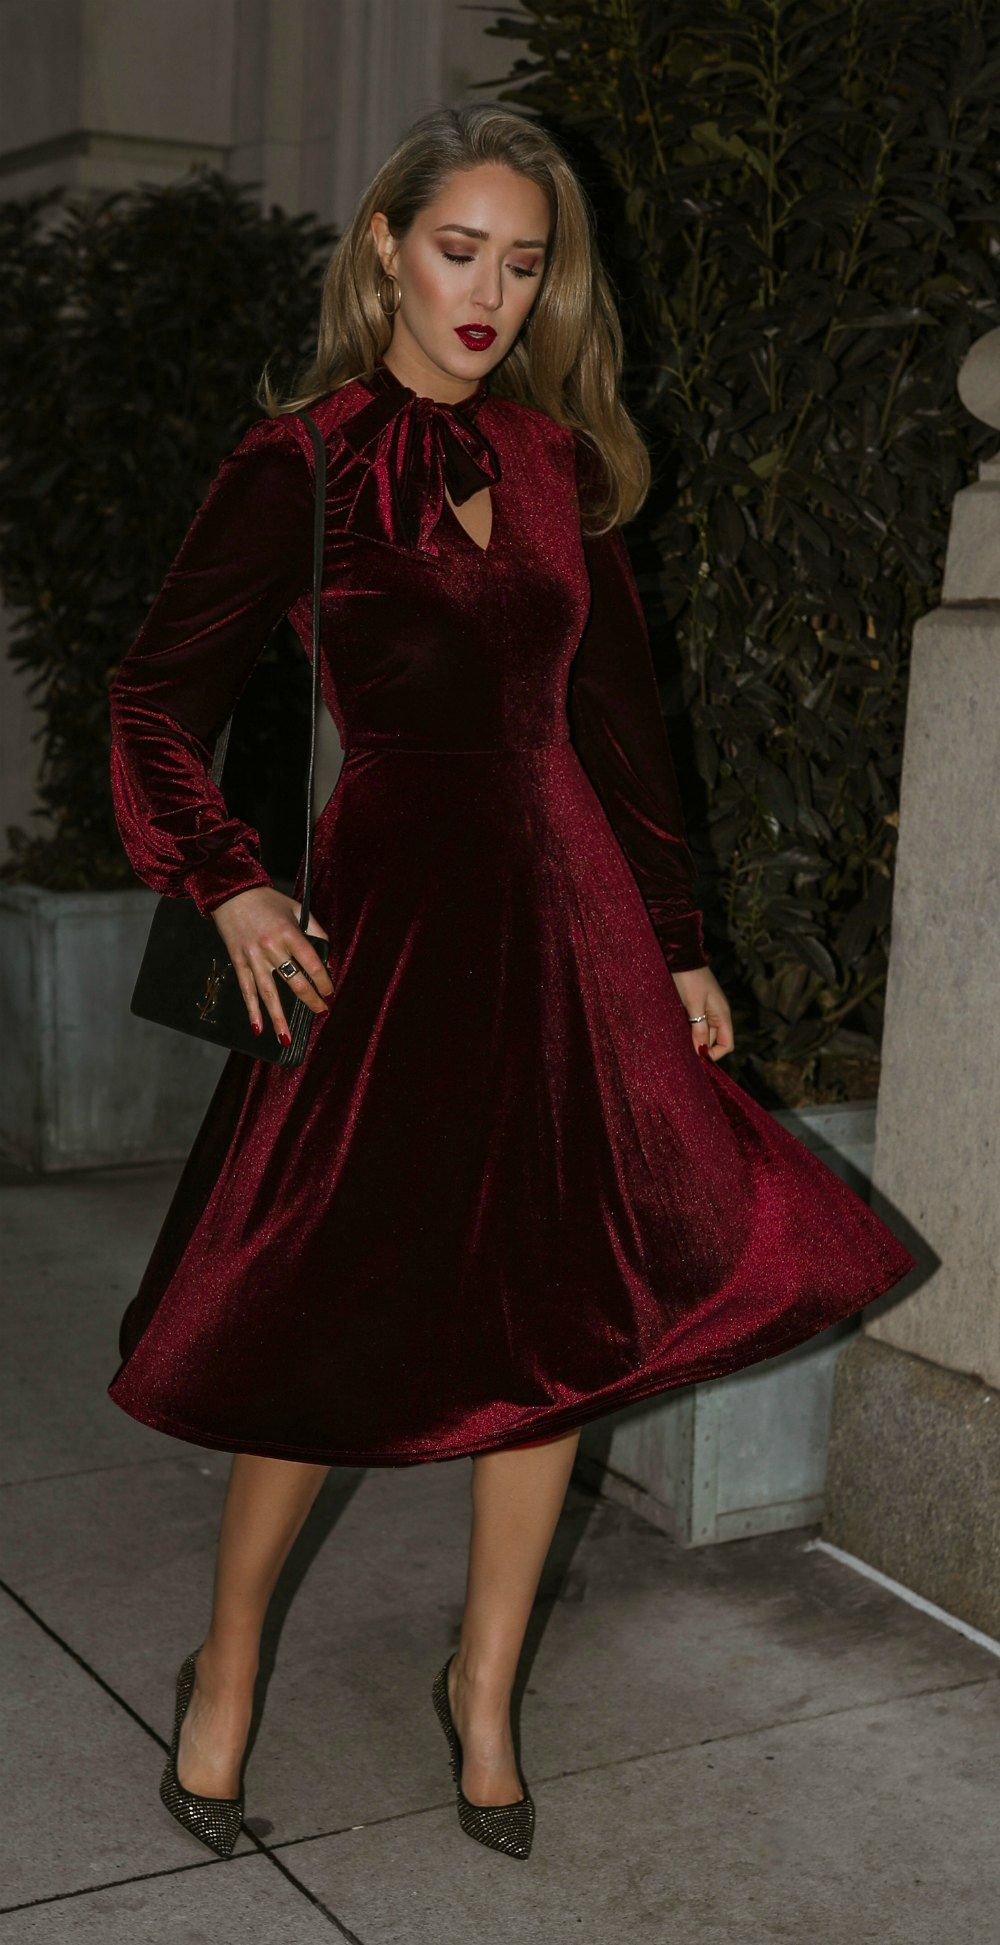 Click For Outfit Details Burgundy Velvet A Line Dress With Tie Neck Long Peasant Sleeves Black Gold Stud Velvet Dresses Outfit Fashion Velvet Fashion [ 1945 x 1000 Pixel ]